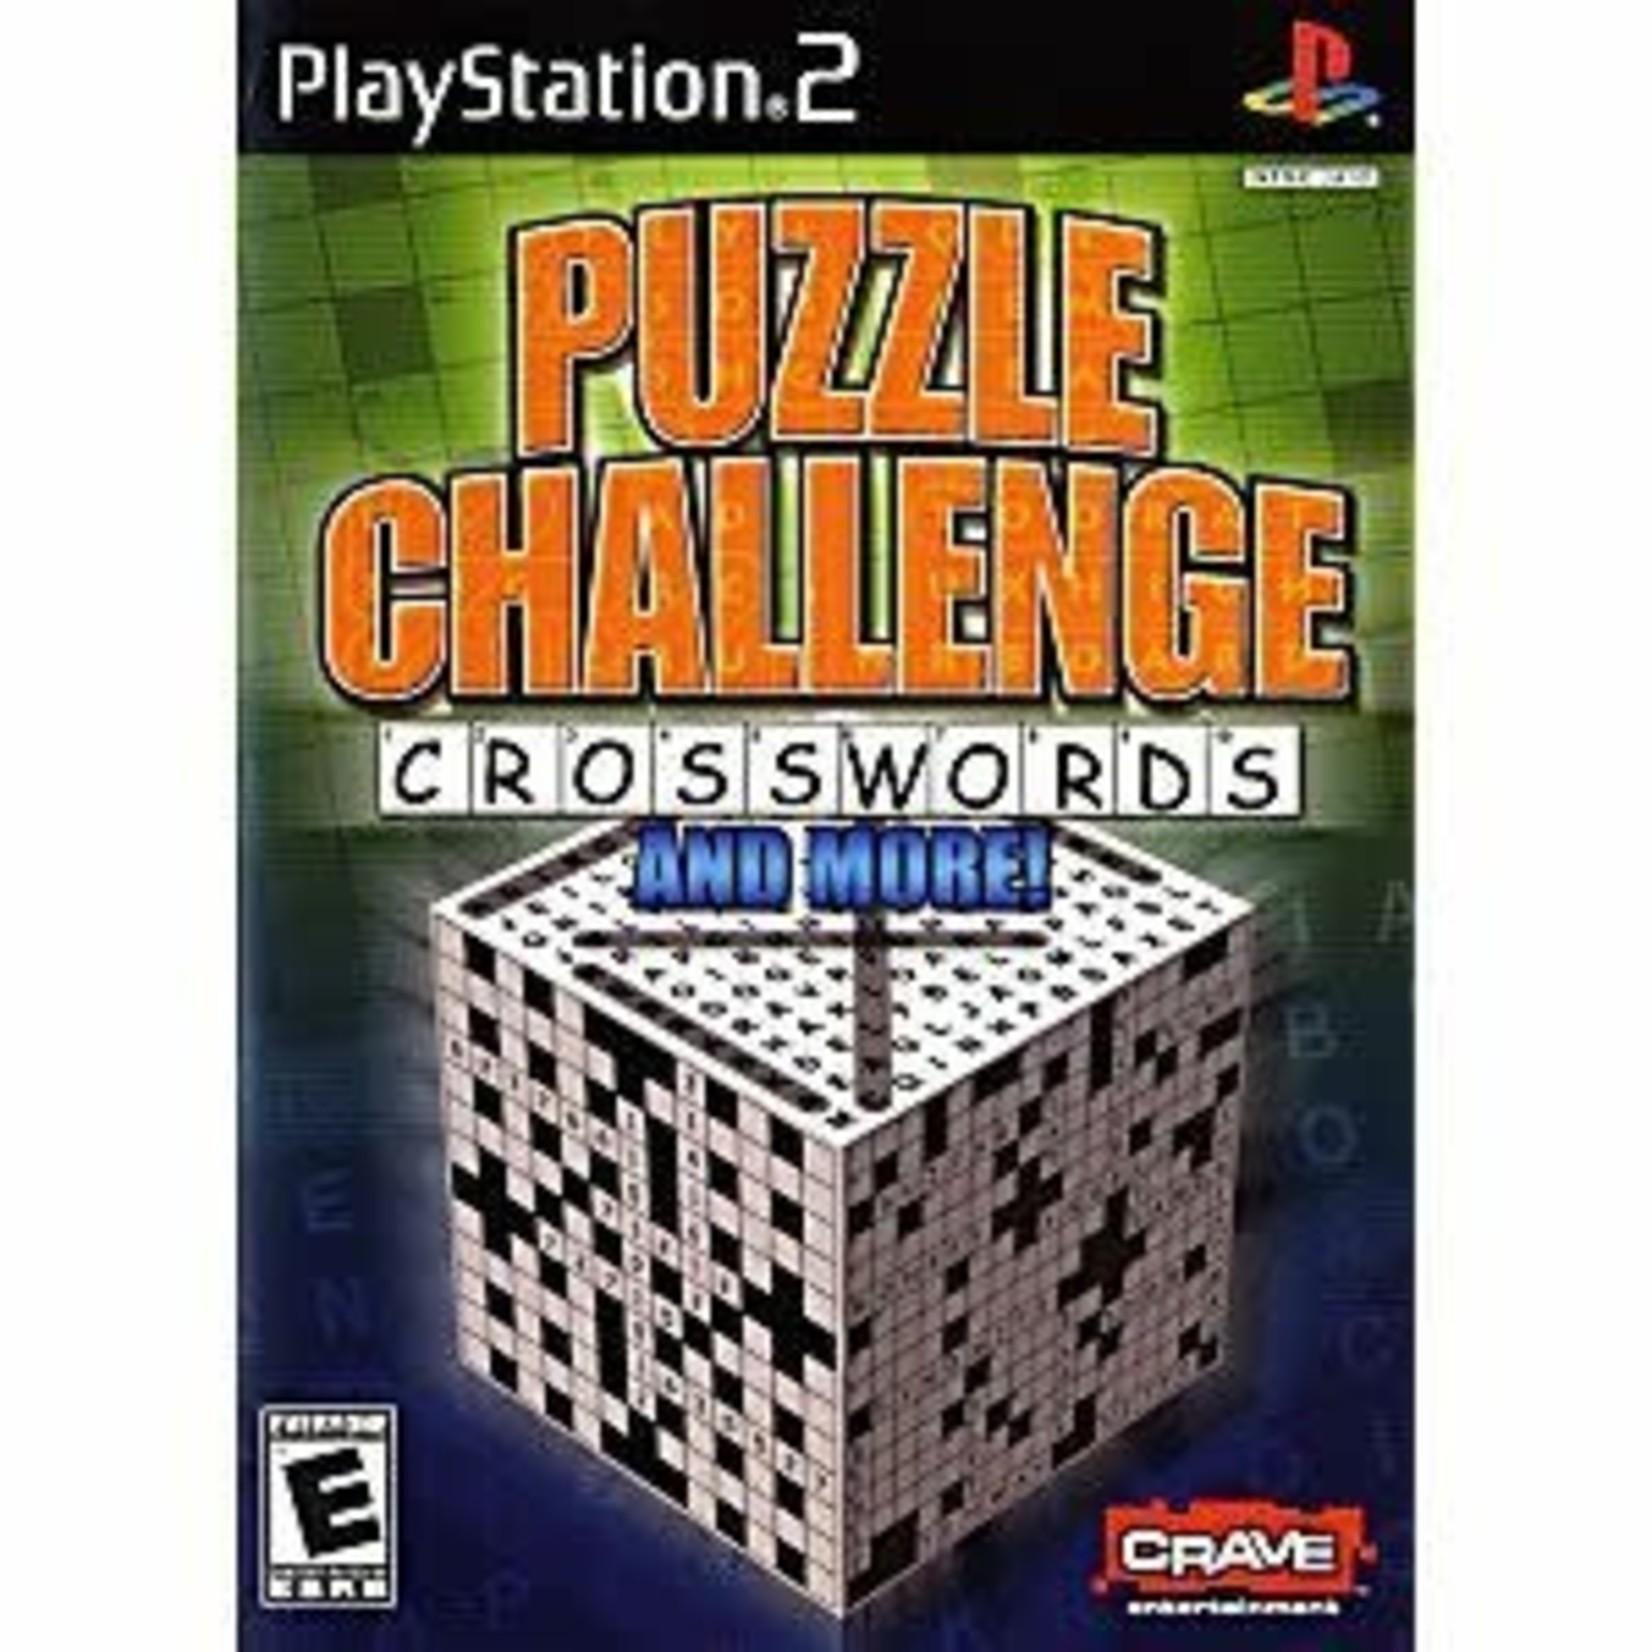 PS2U-PUZZLE CHALLENGE